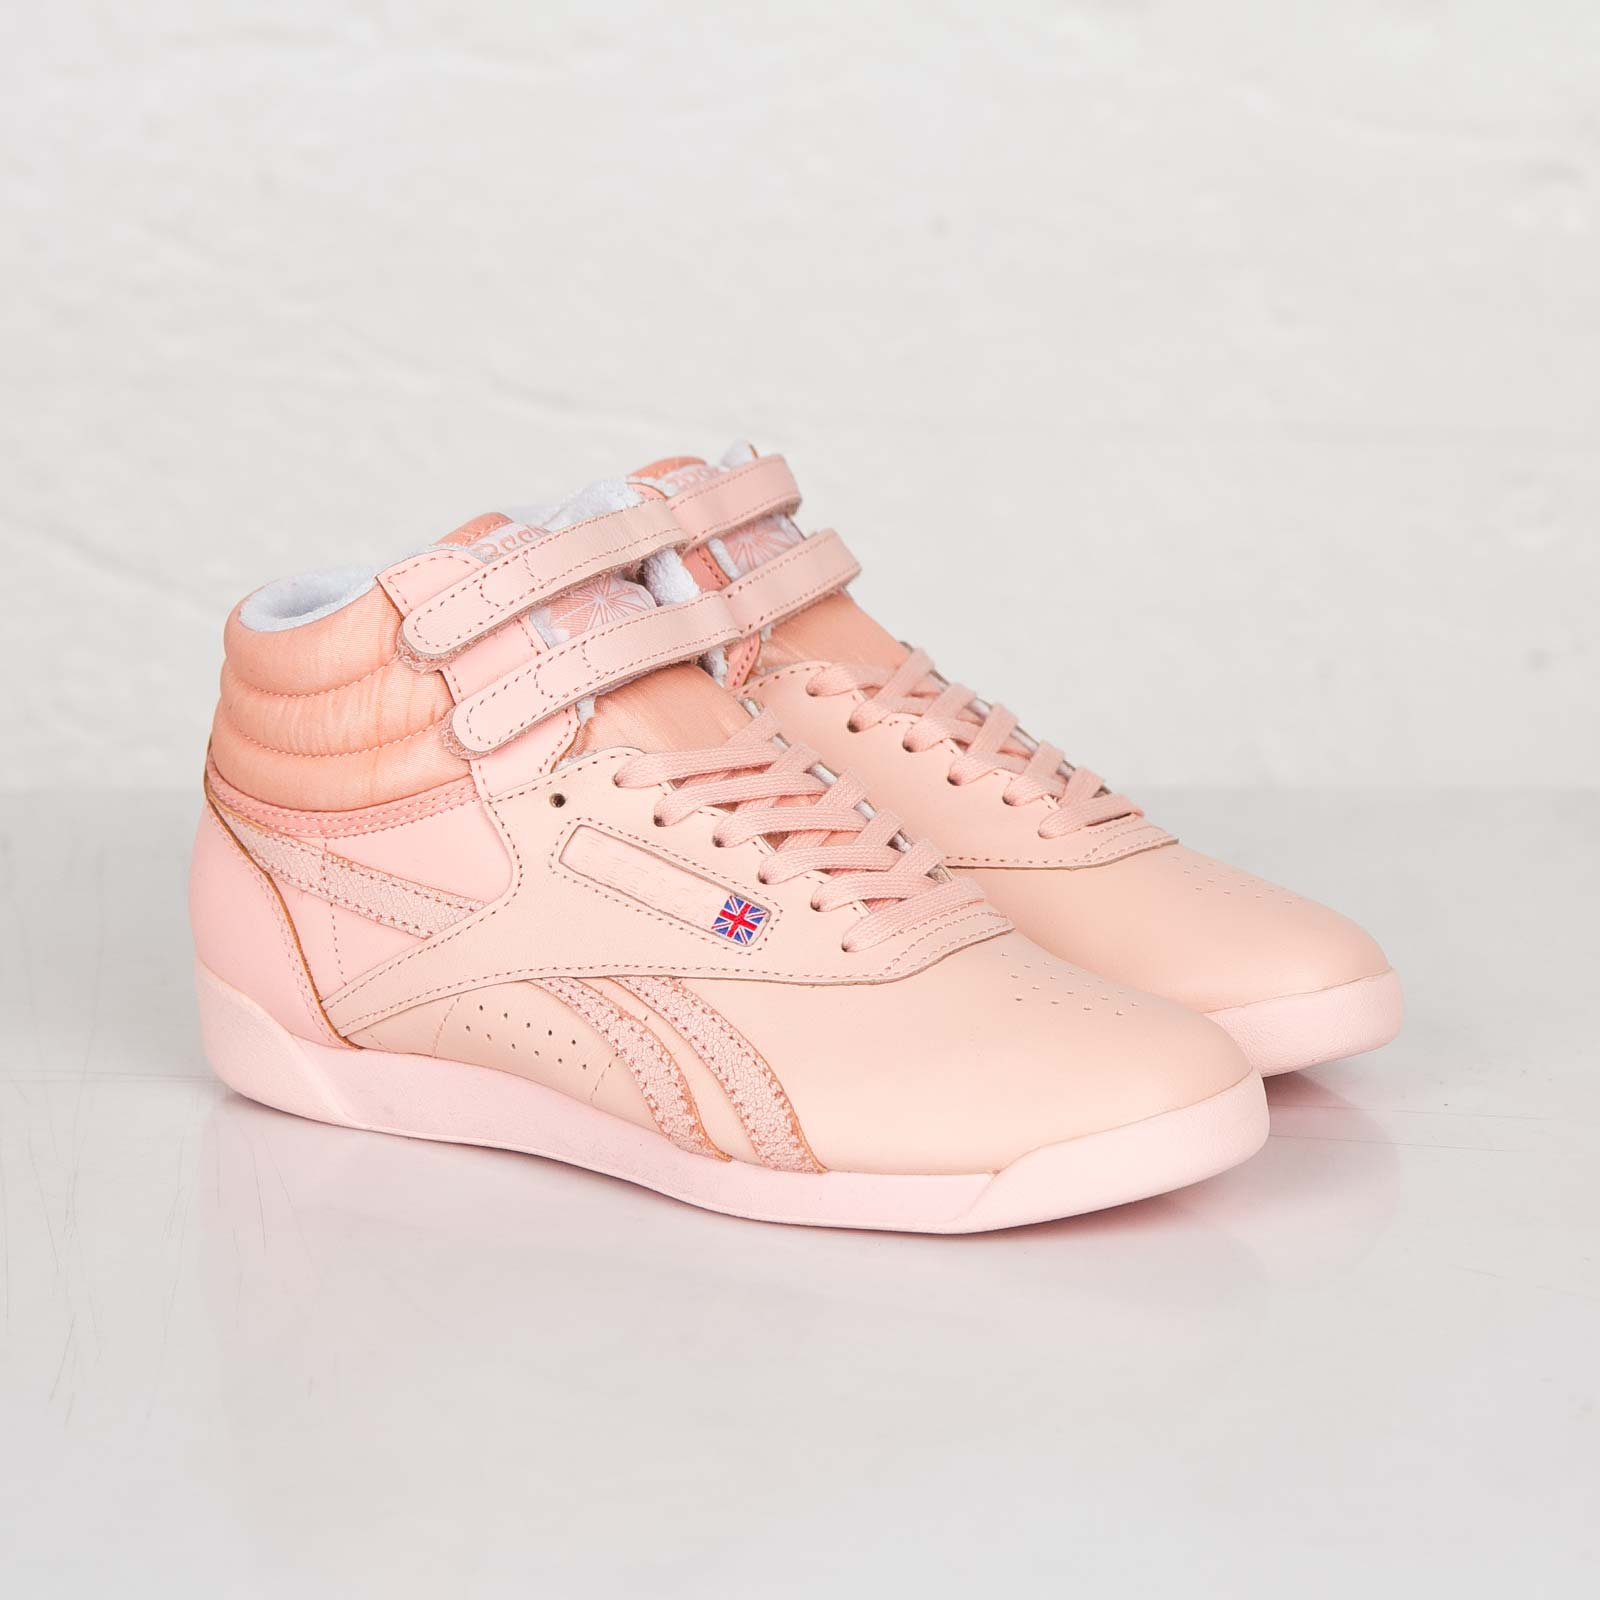 Reebok Freestyle Hi Spirit - M45864 - Sneakersnstuff  3c5f853b5